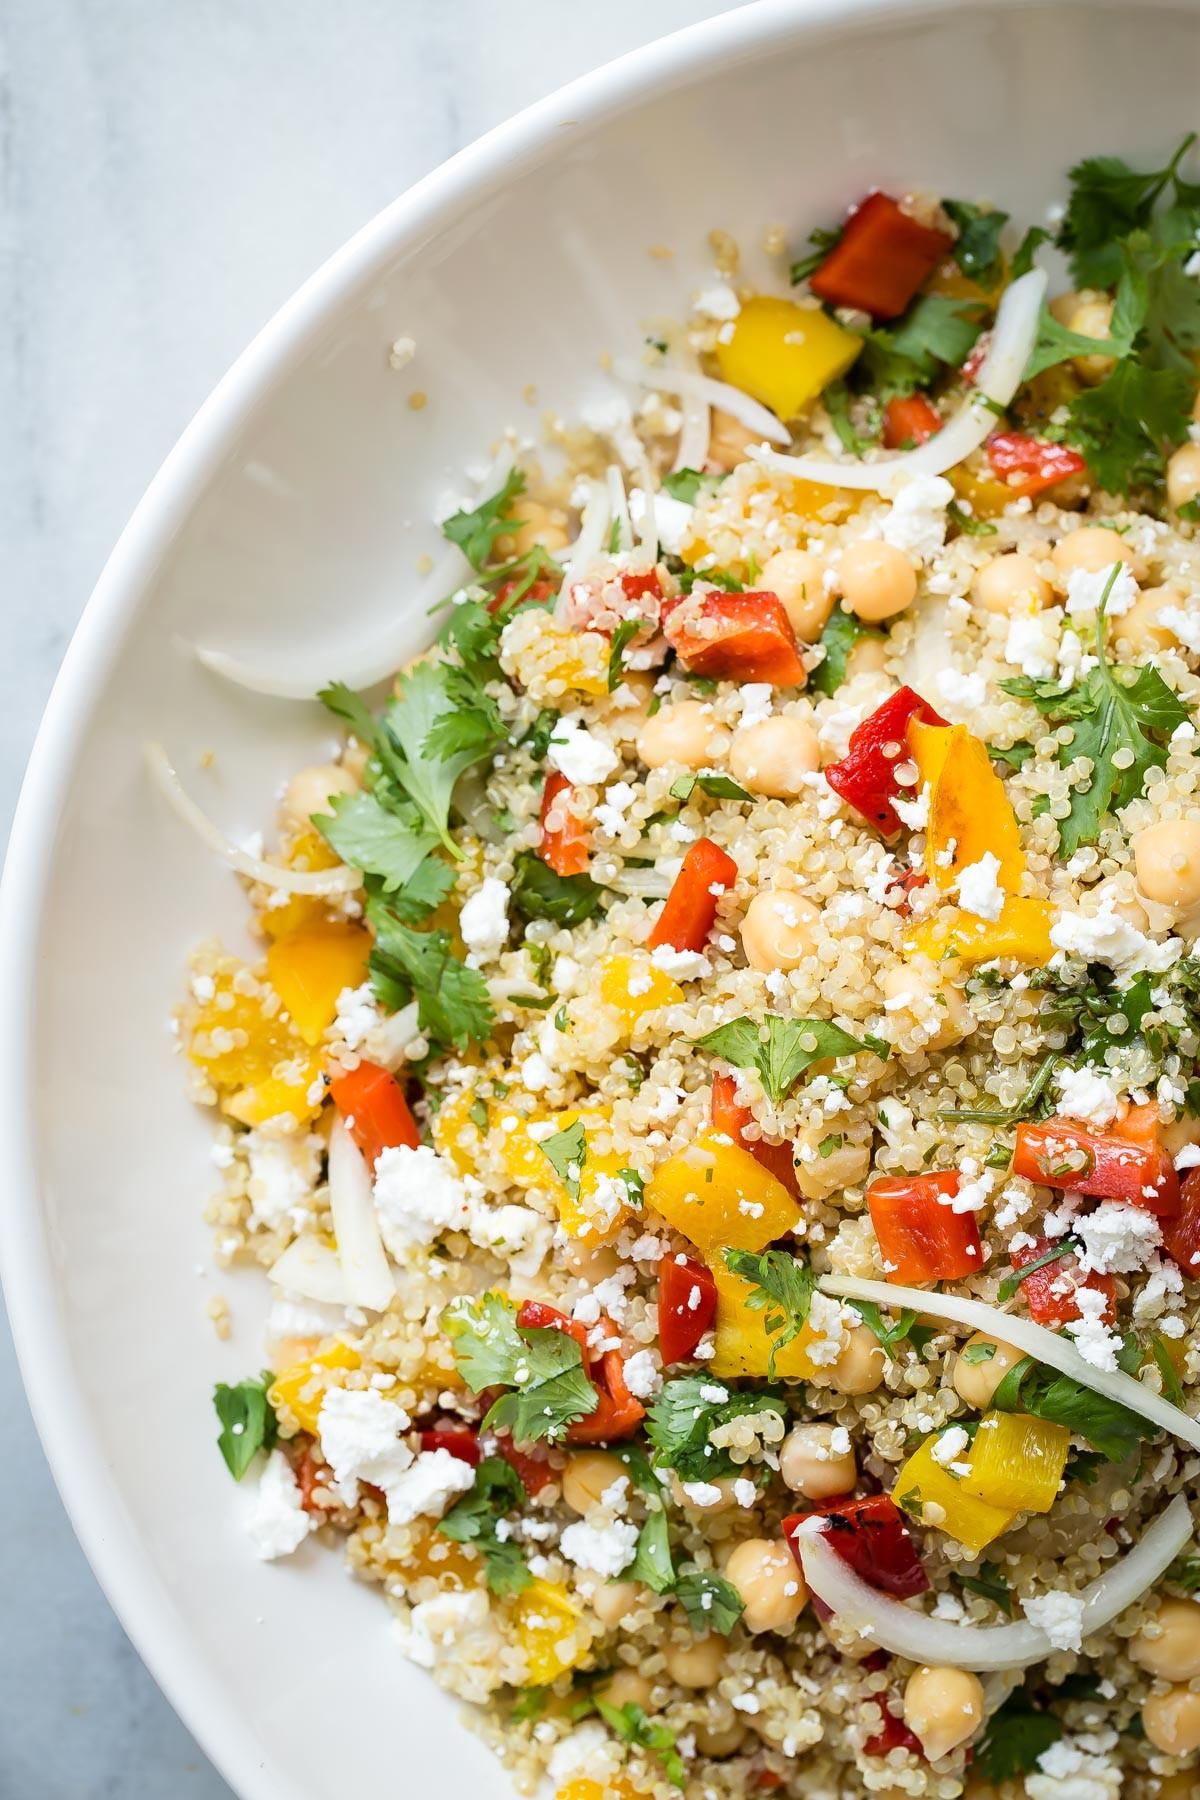 Quinoa Recipe Healthy  Healthy Quinoa Salad with Feta Cheese